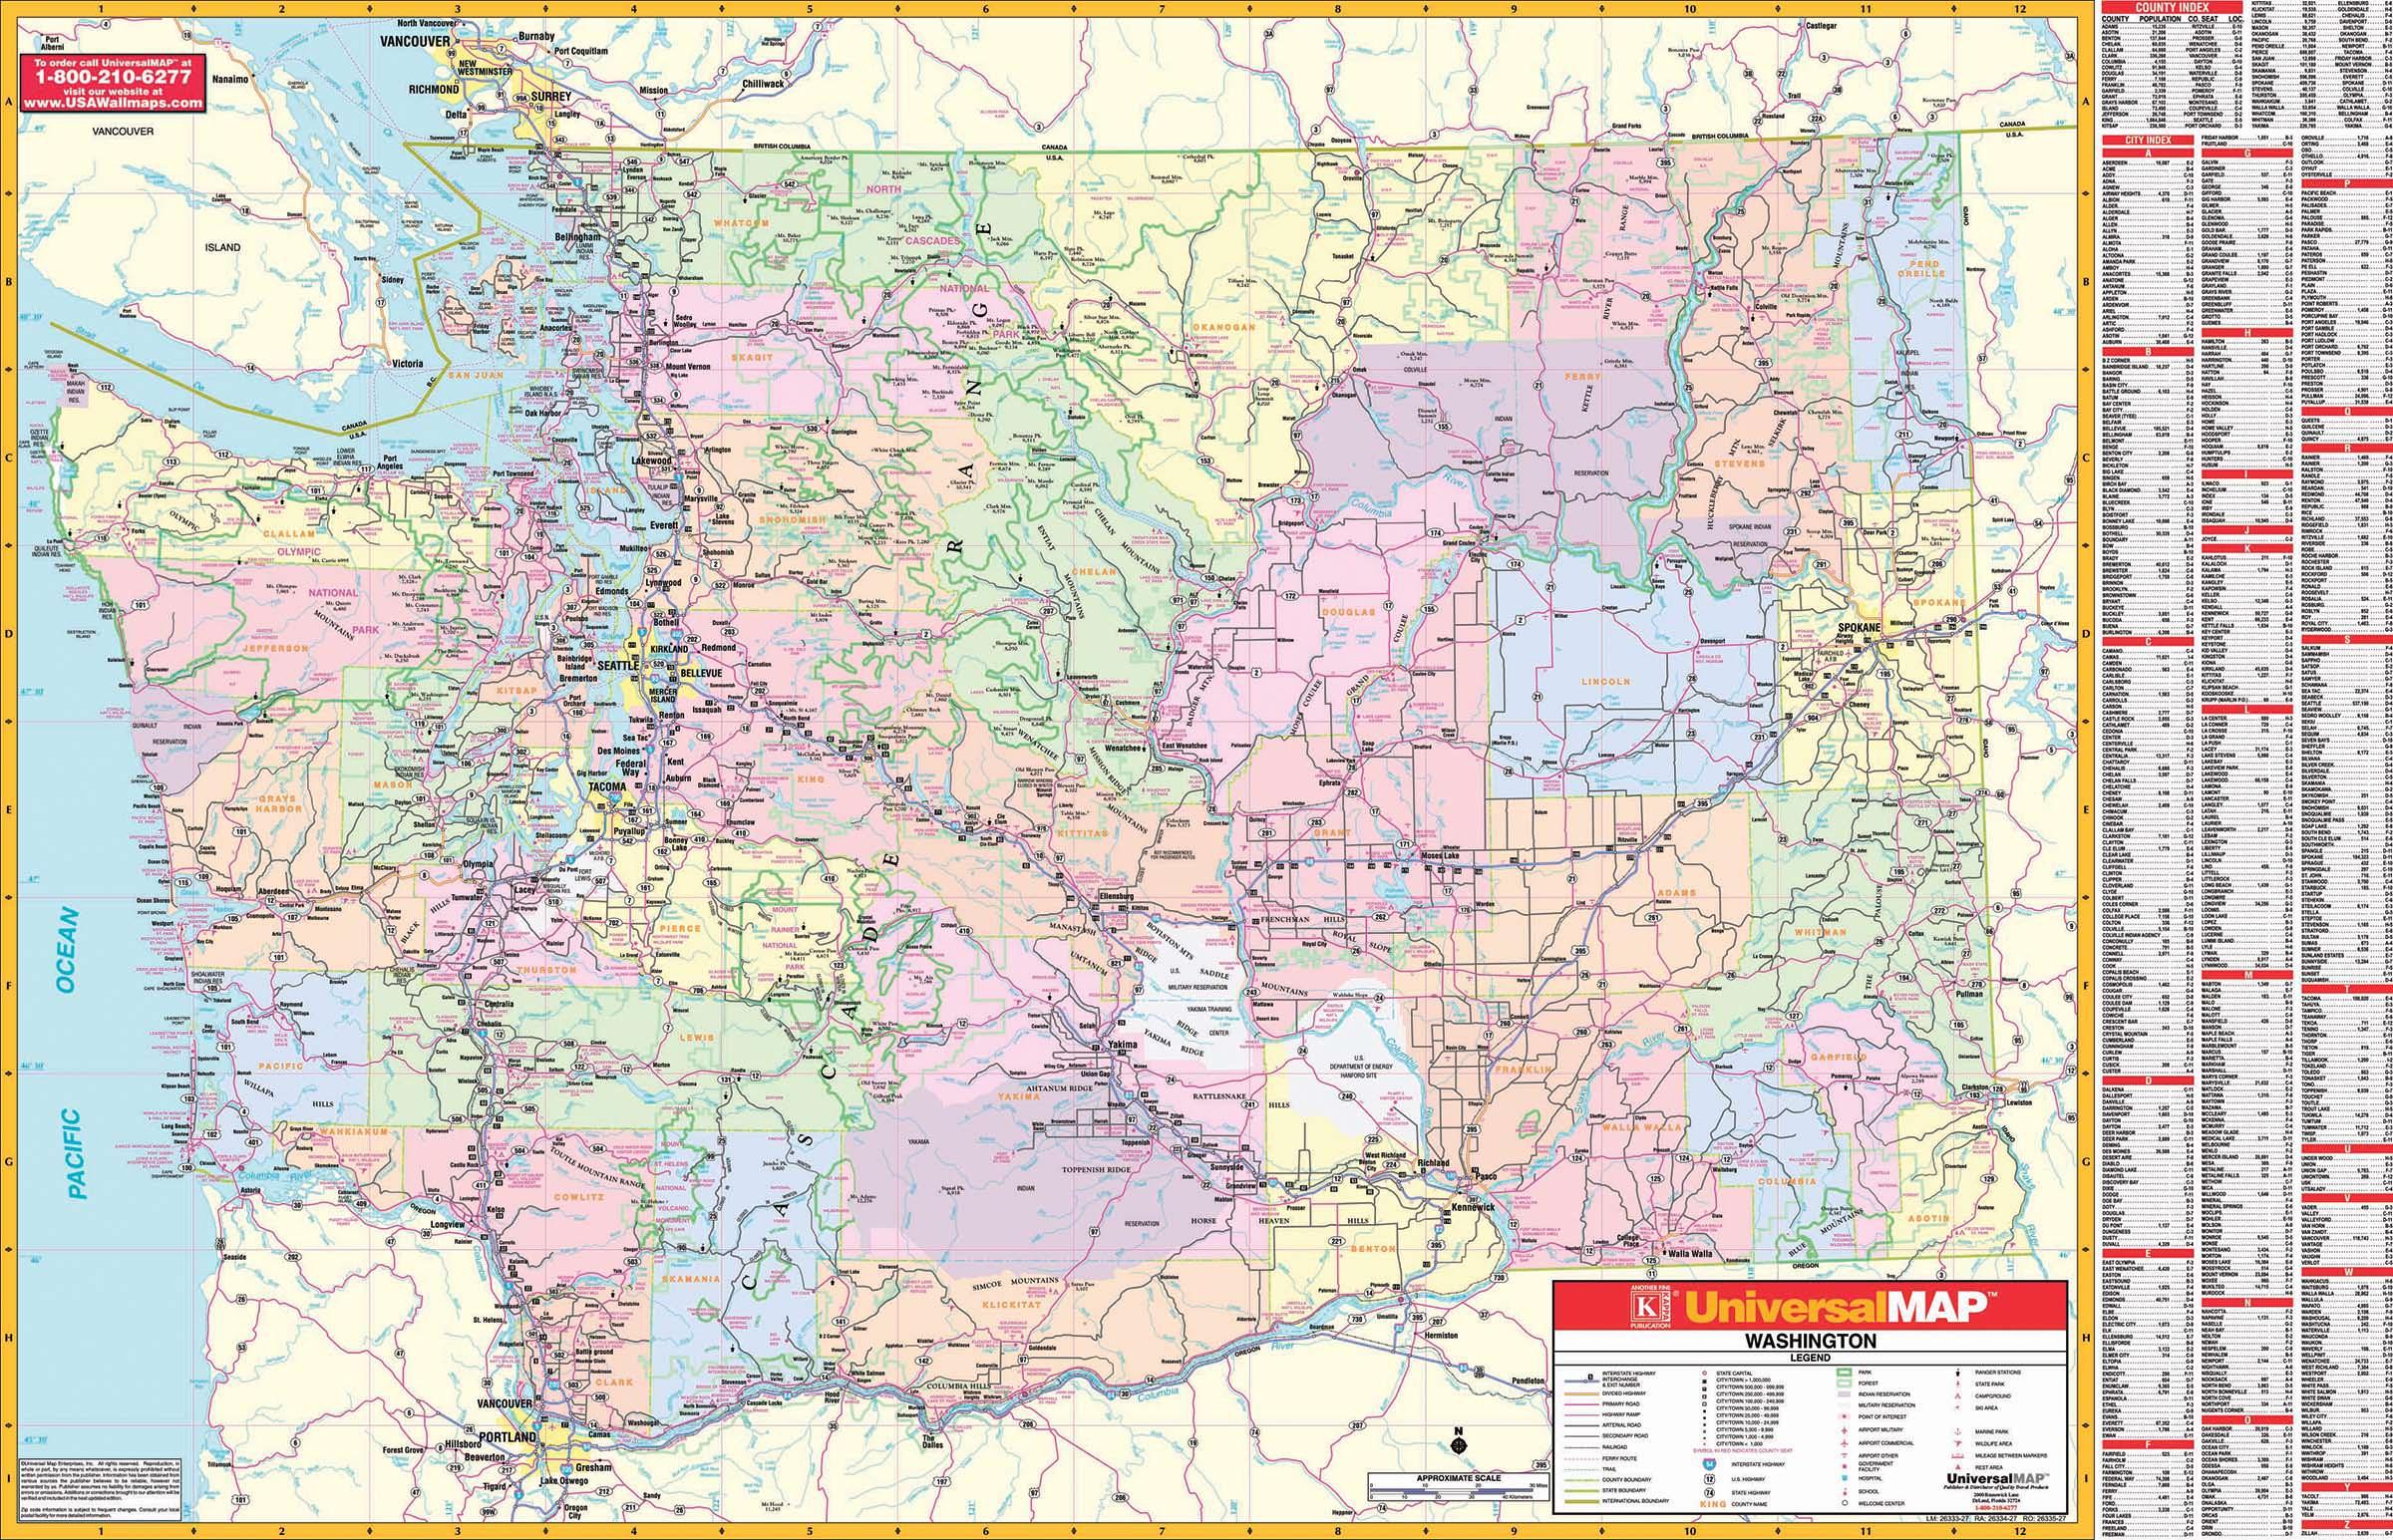 Washington State Wall Map – Kappa Map Group - Giant Texas Wall Map